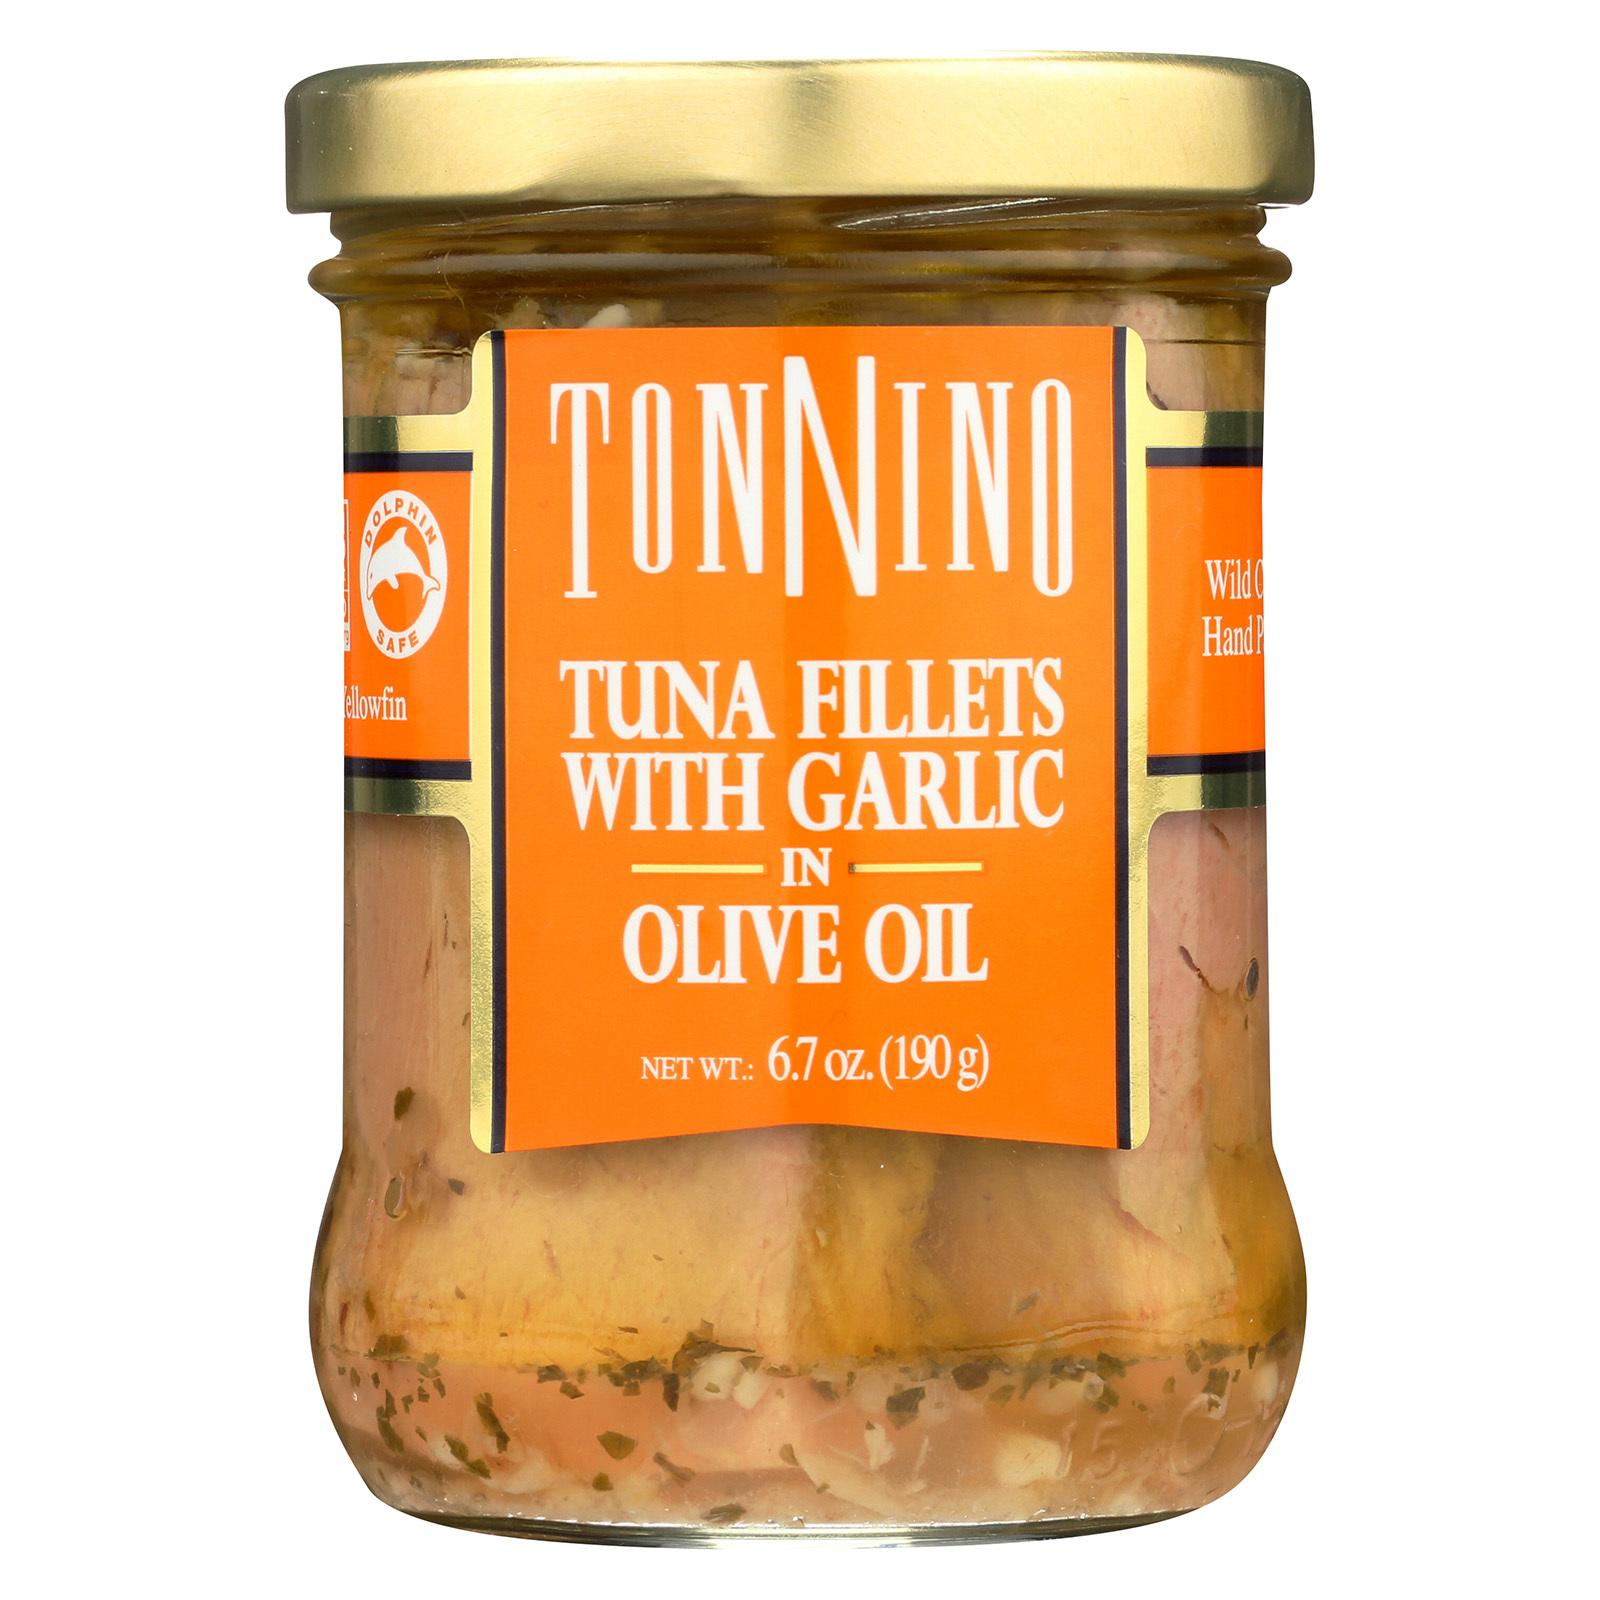 Tonnino Tuna Fillets - Garlic, Olive Oil - Case of 6 - 6.7 oz.